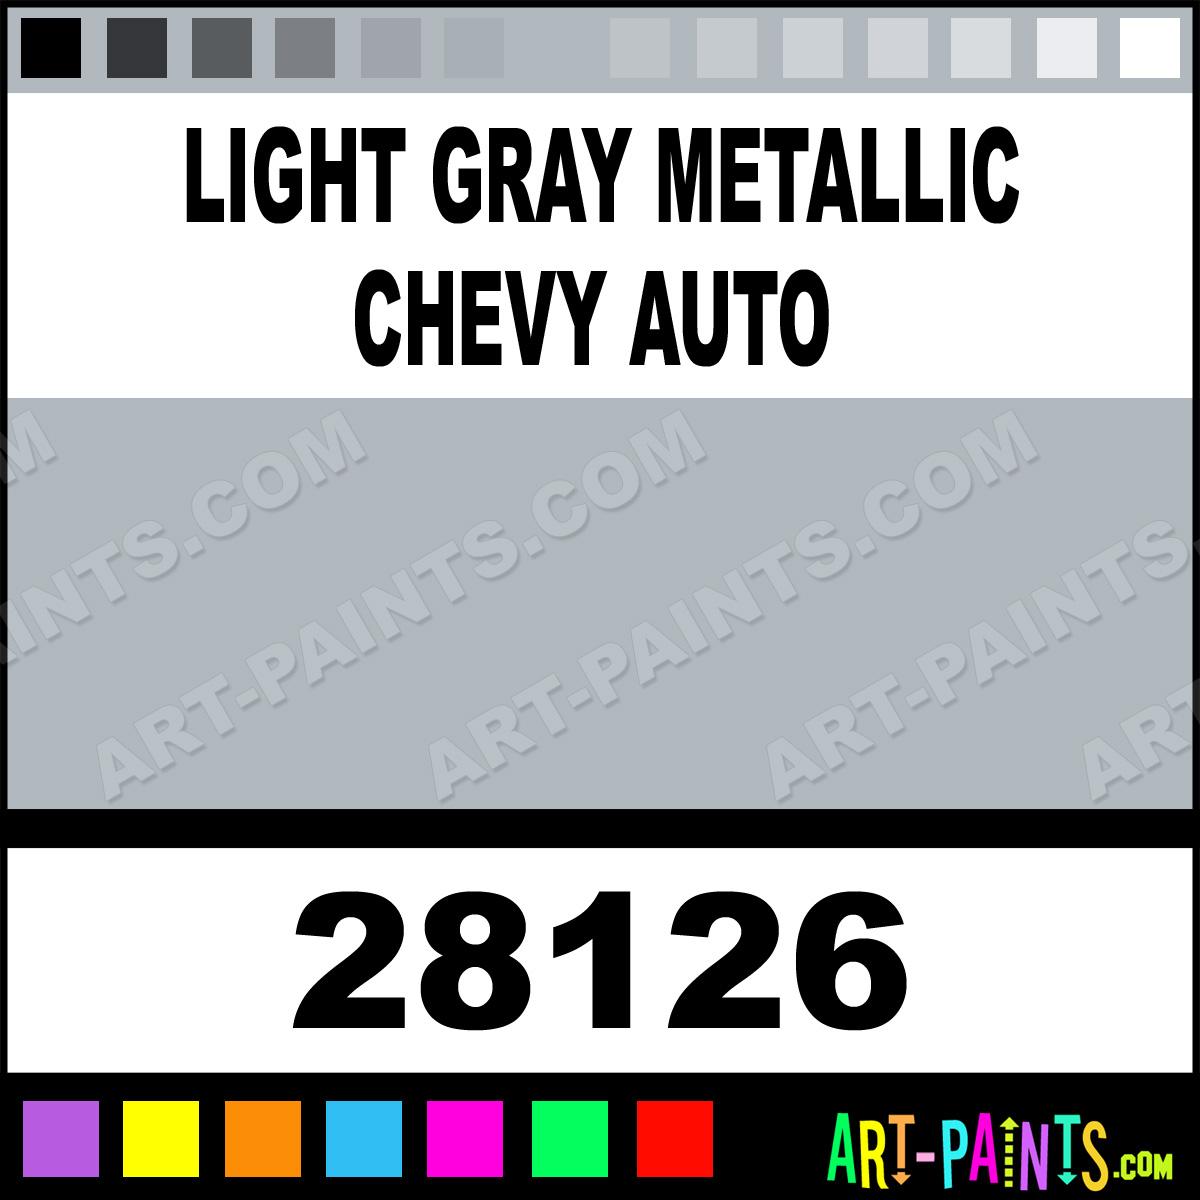 Light Gray Metallic Chevy Auto